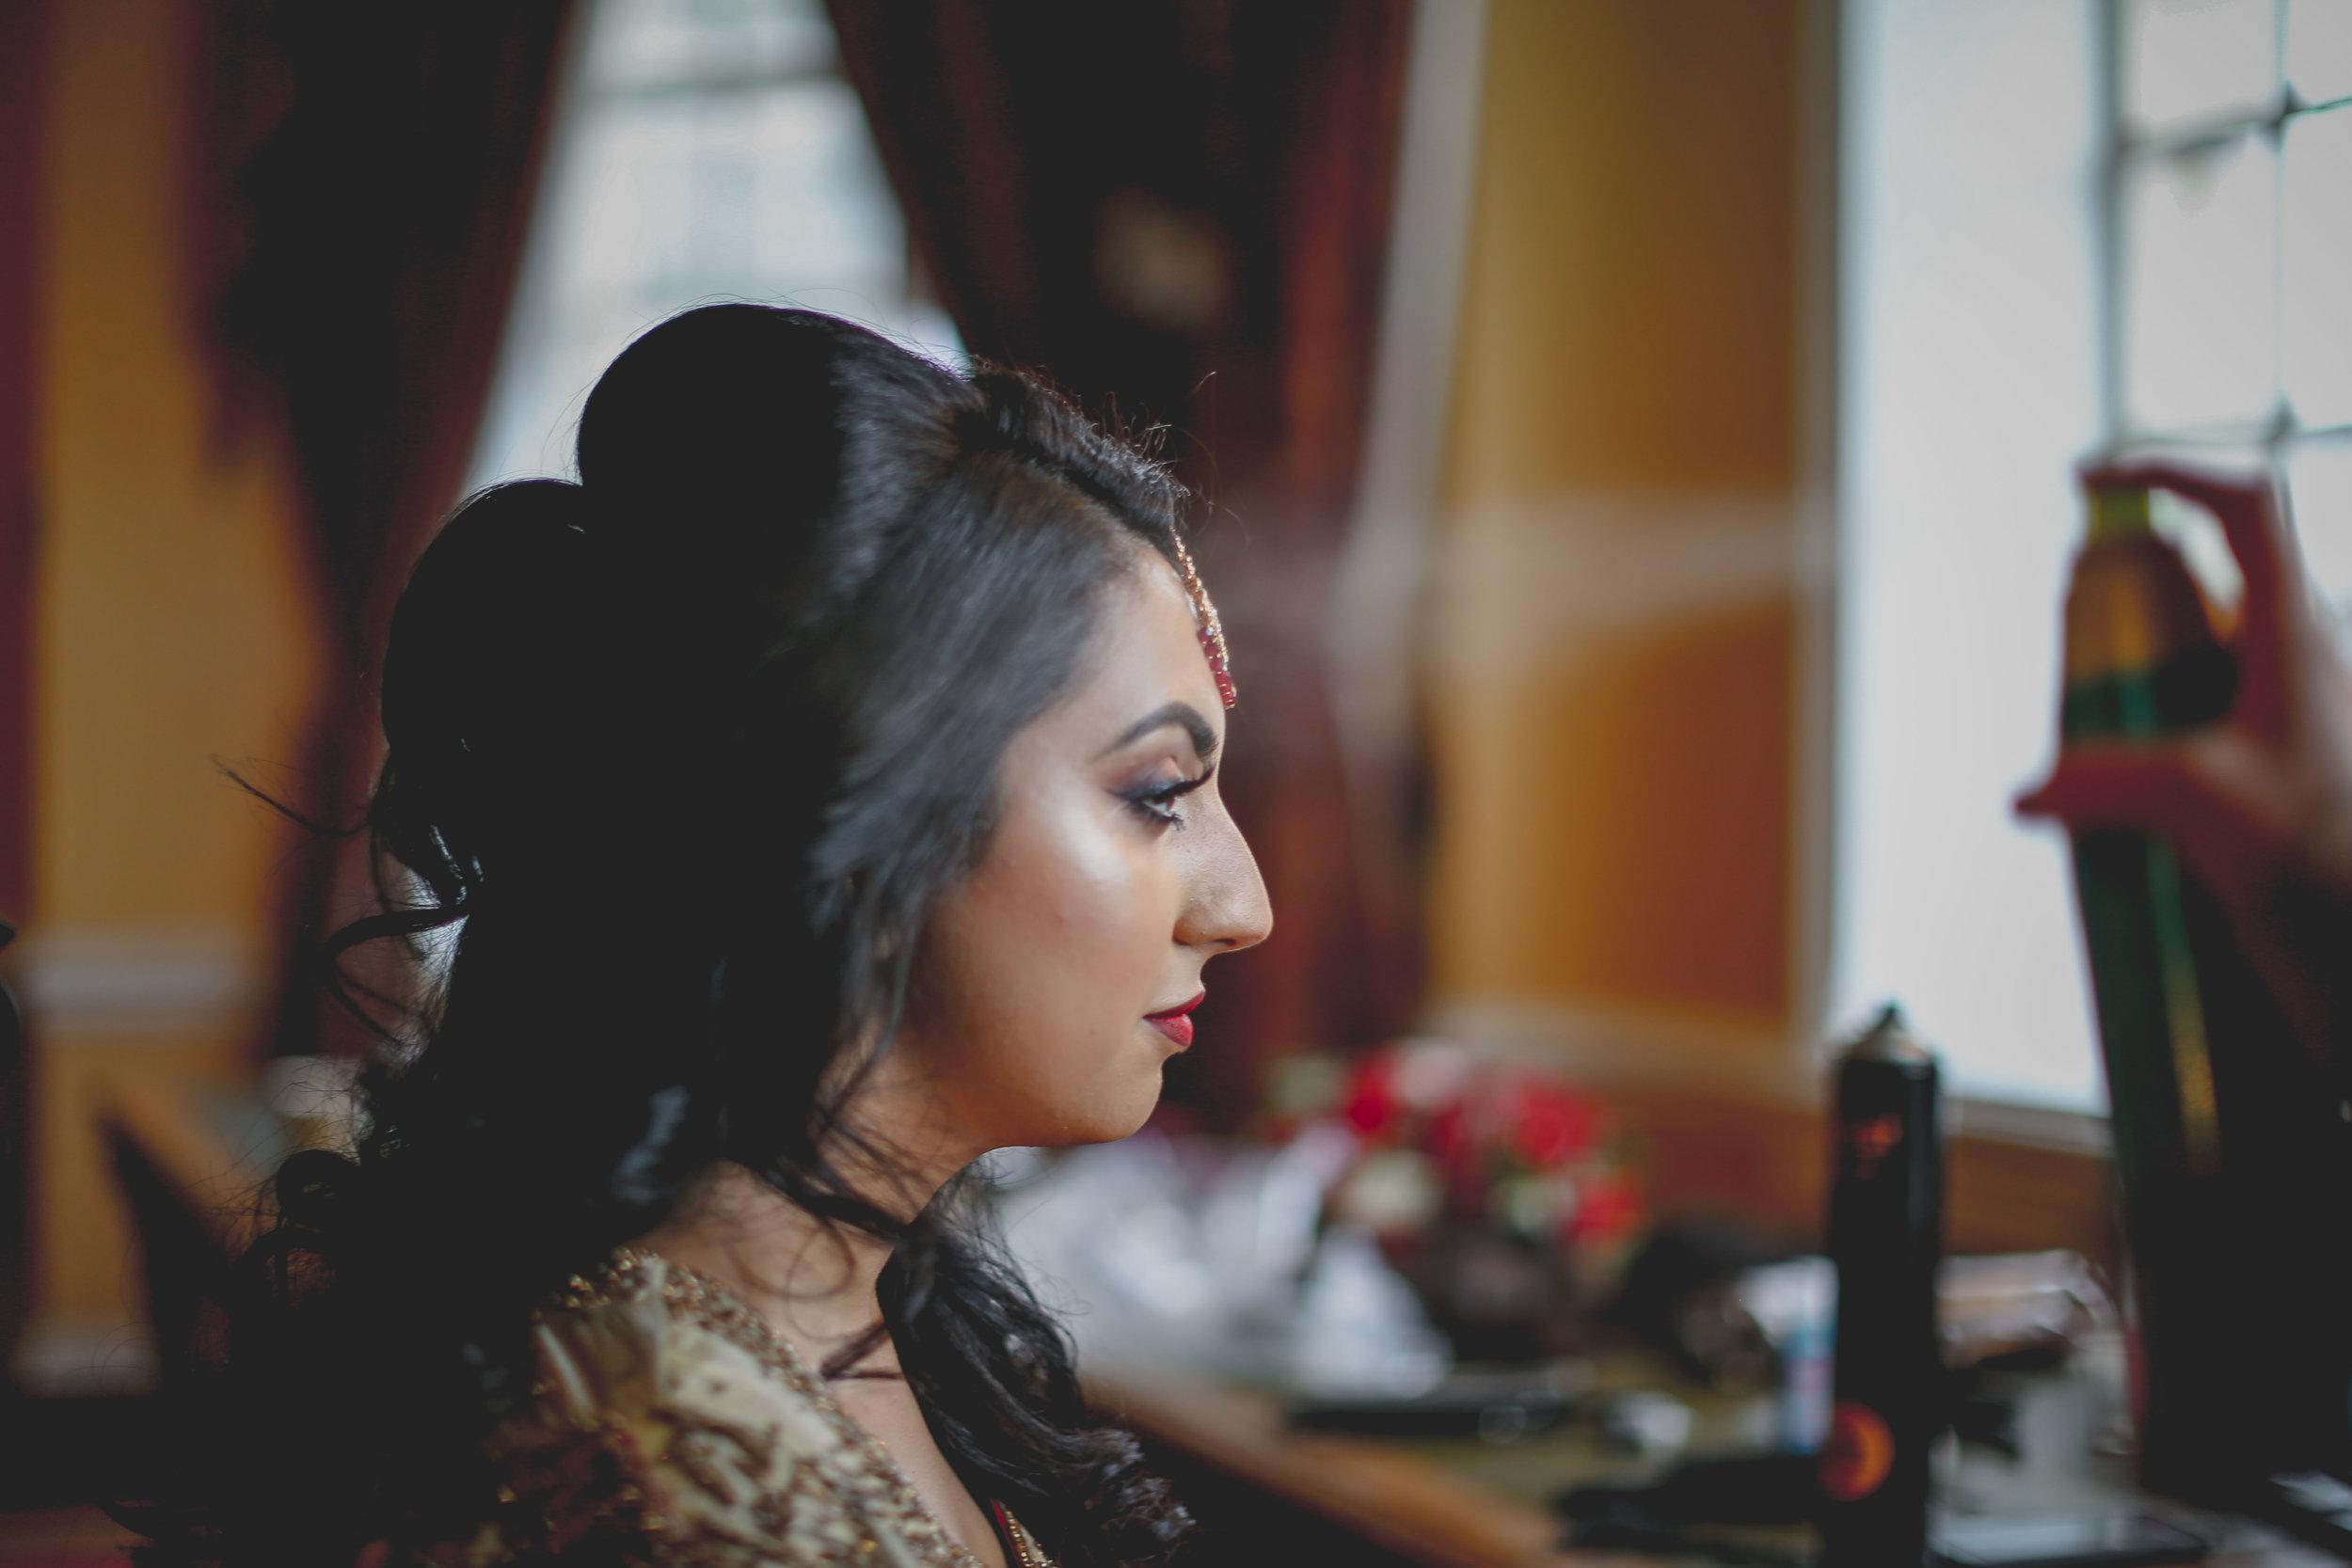 Female-asian-wedding-photographer-Cardiff-City-Hall-natalia-smith-photography-13.jpg